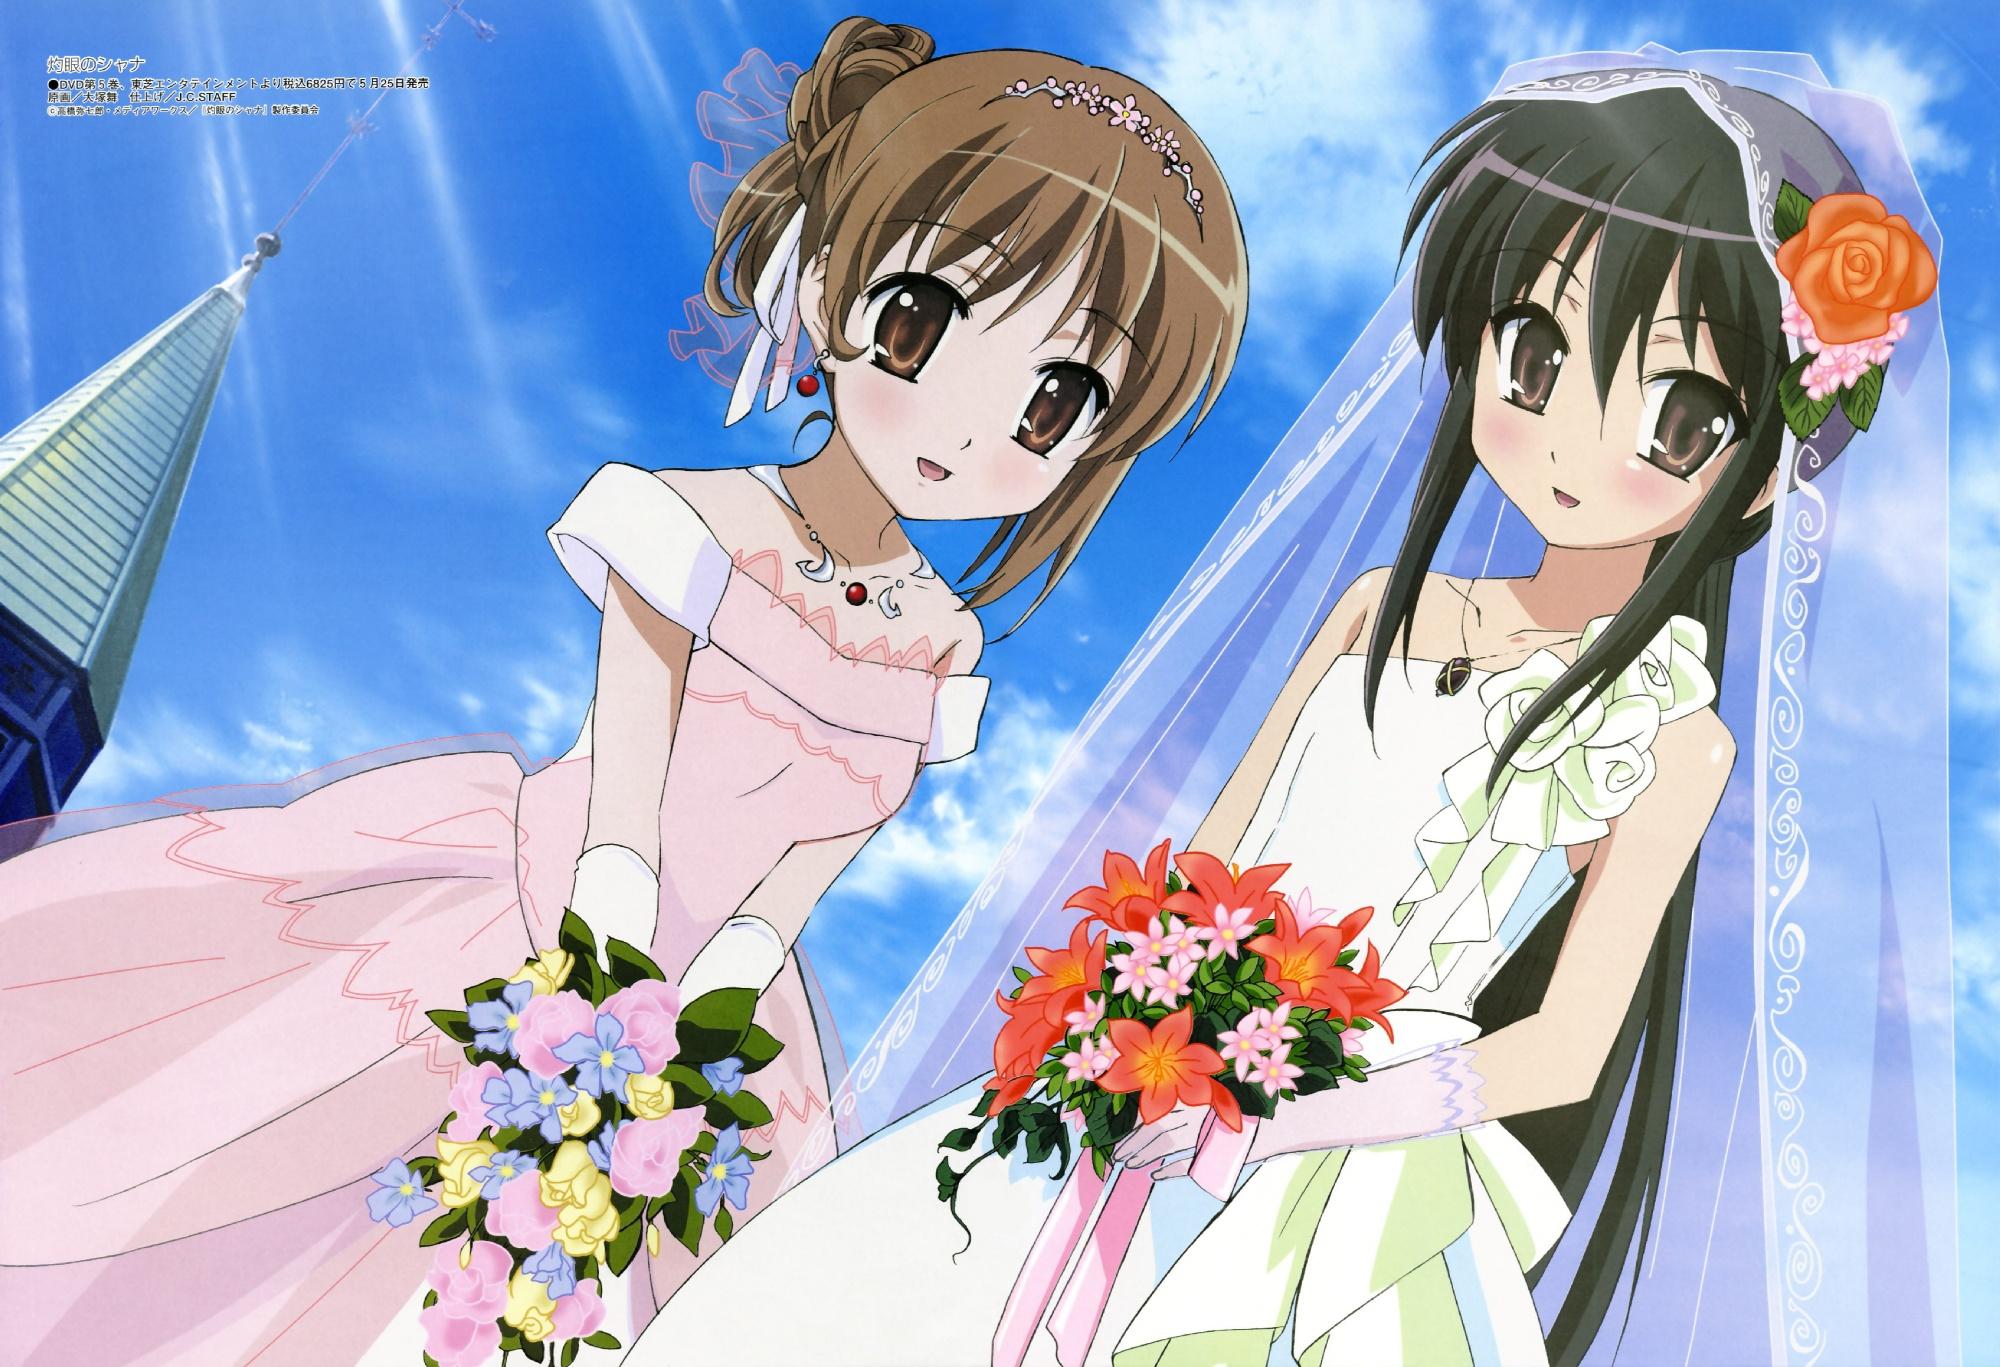 loli megami scan shakugan_no_shana shana wedding_attire yoshida_kazumi